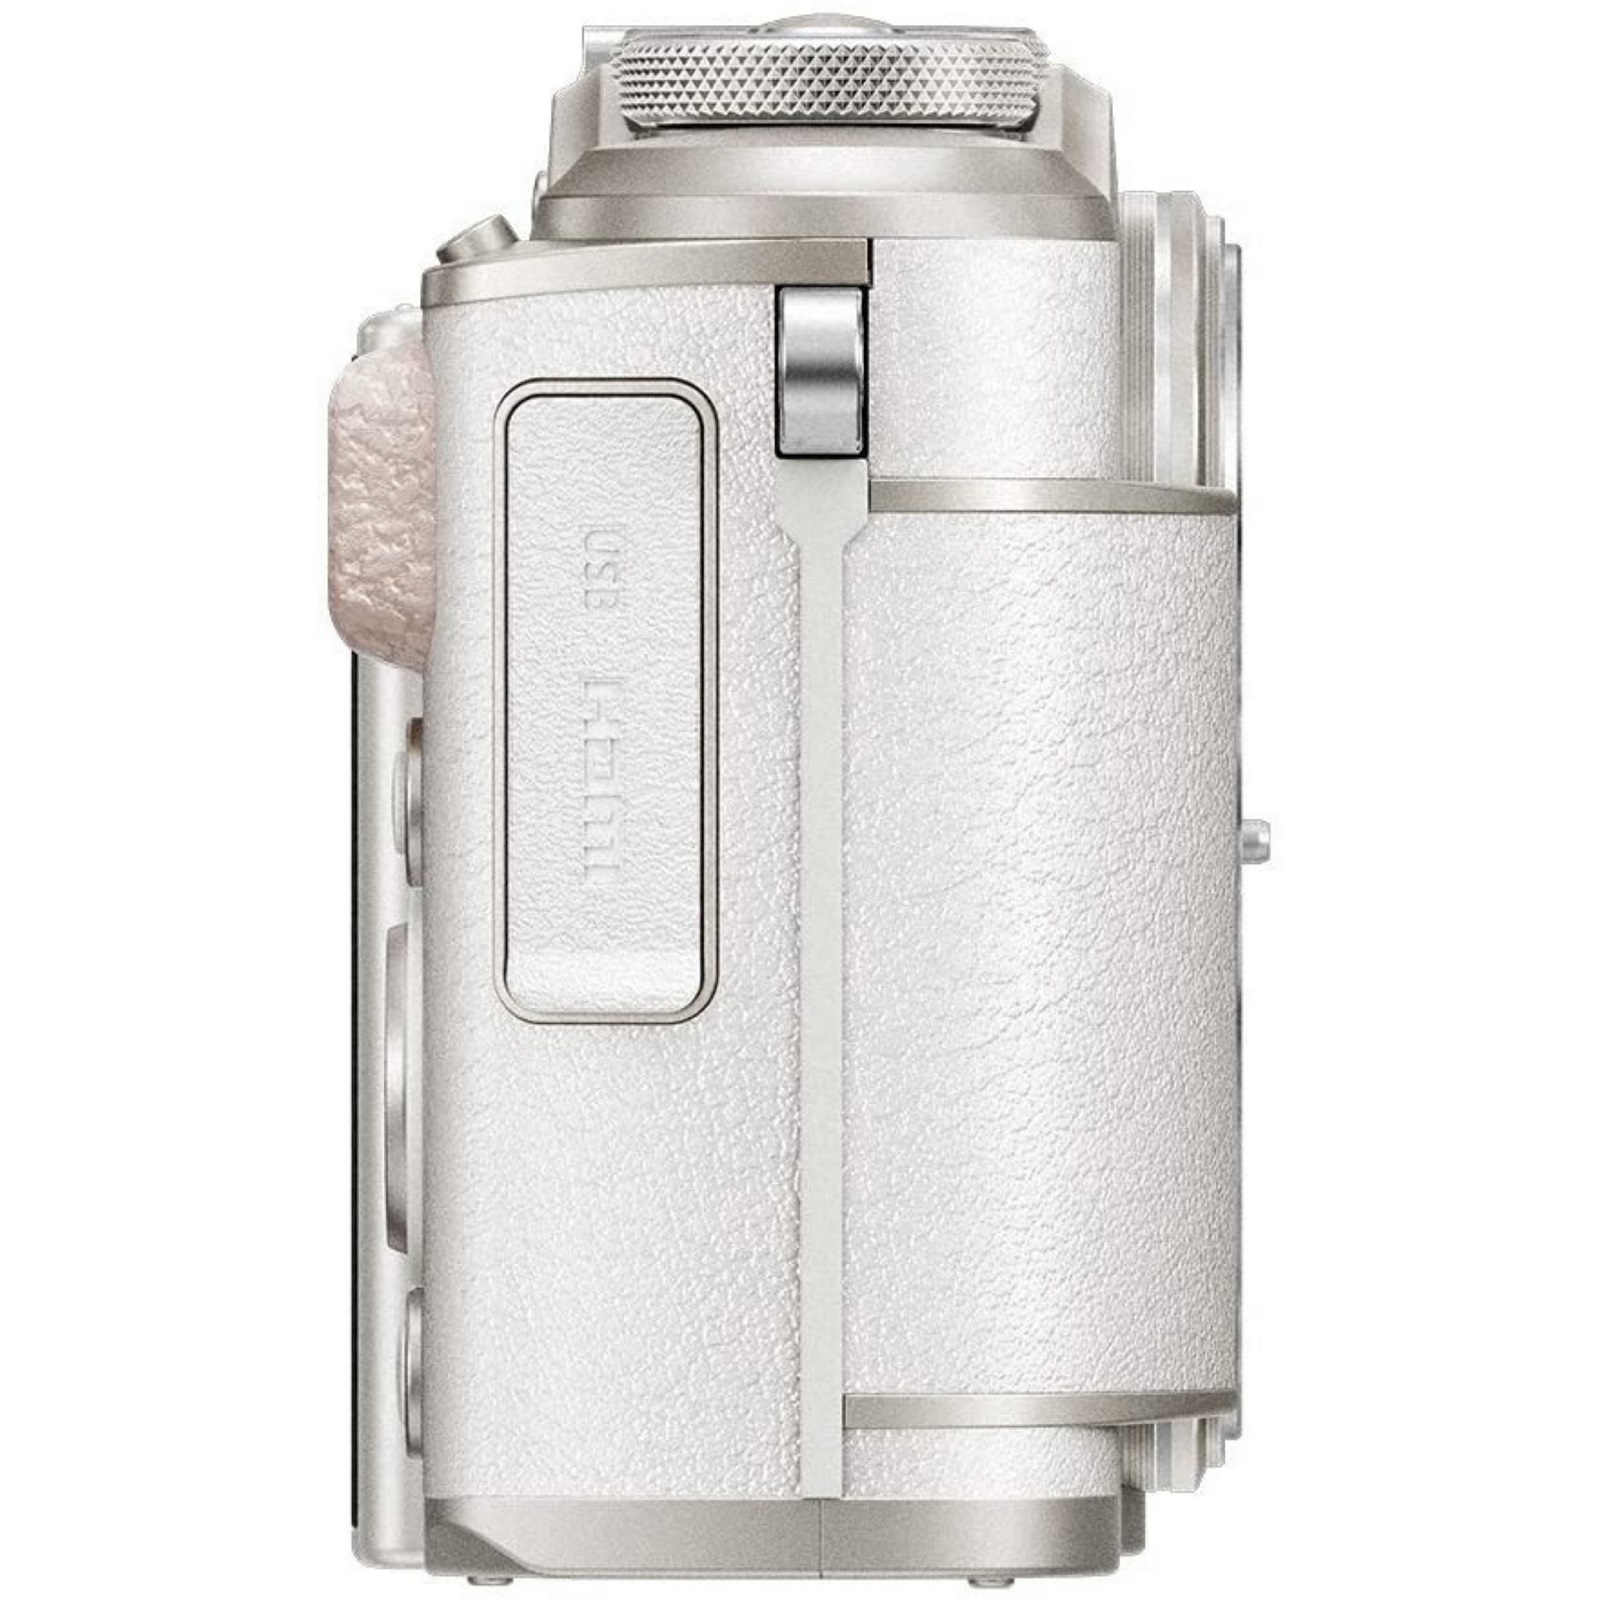 OLYMPUS オリンパス ミラーレス一眼カメラ PEN E-PL9 ボディー ホワイト 新品